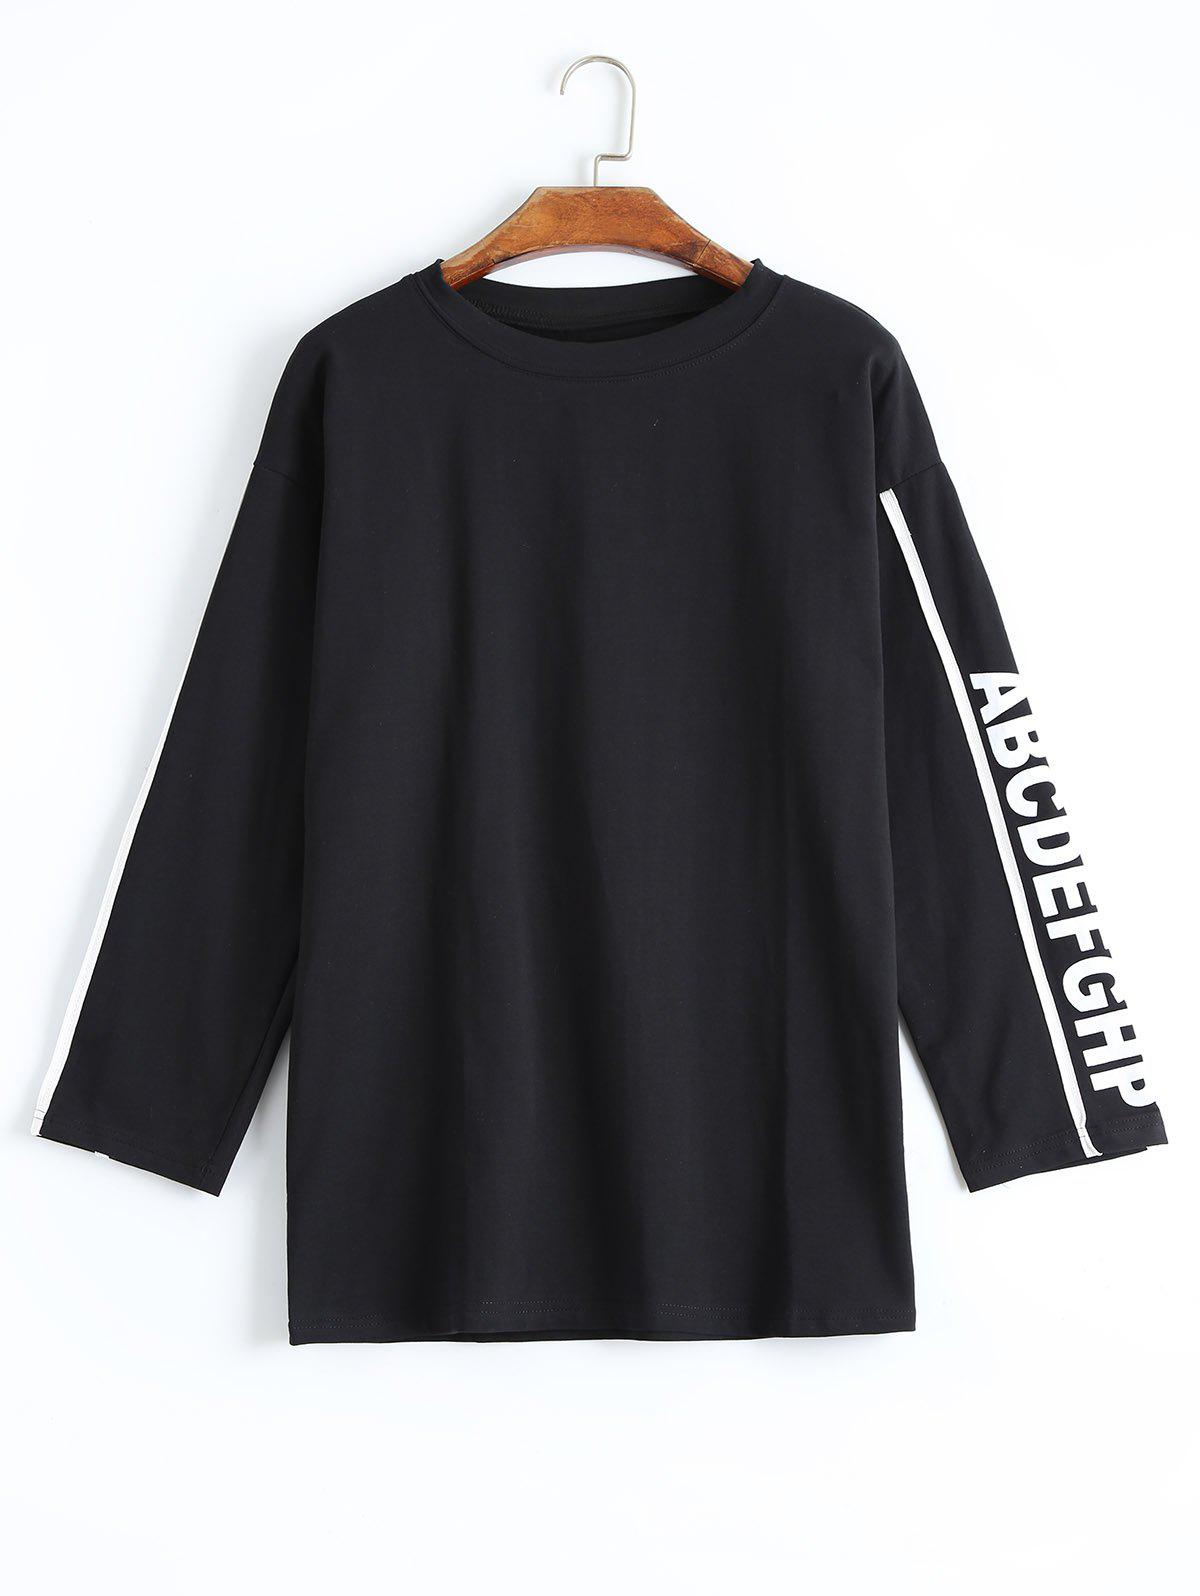 Image of Longline Alphabet Letter T-shirt